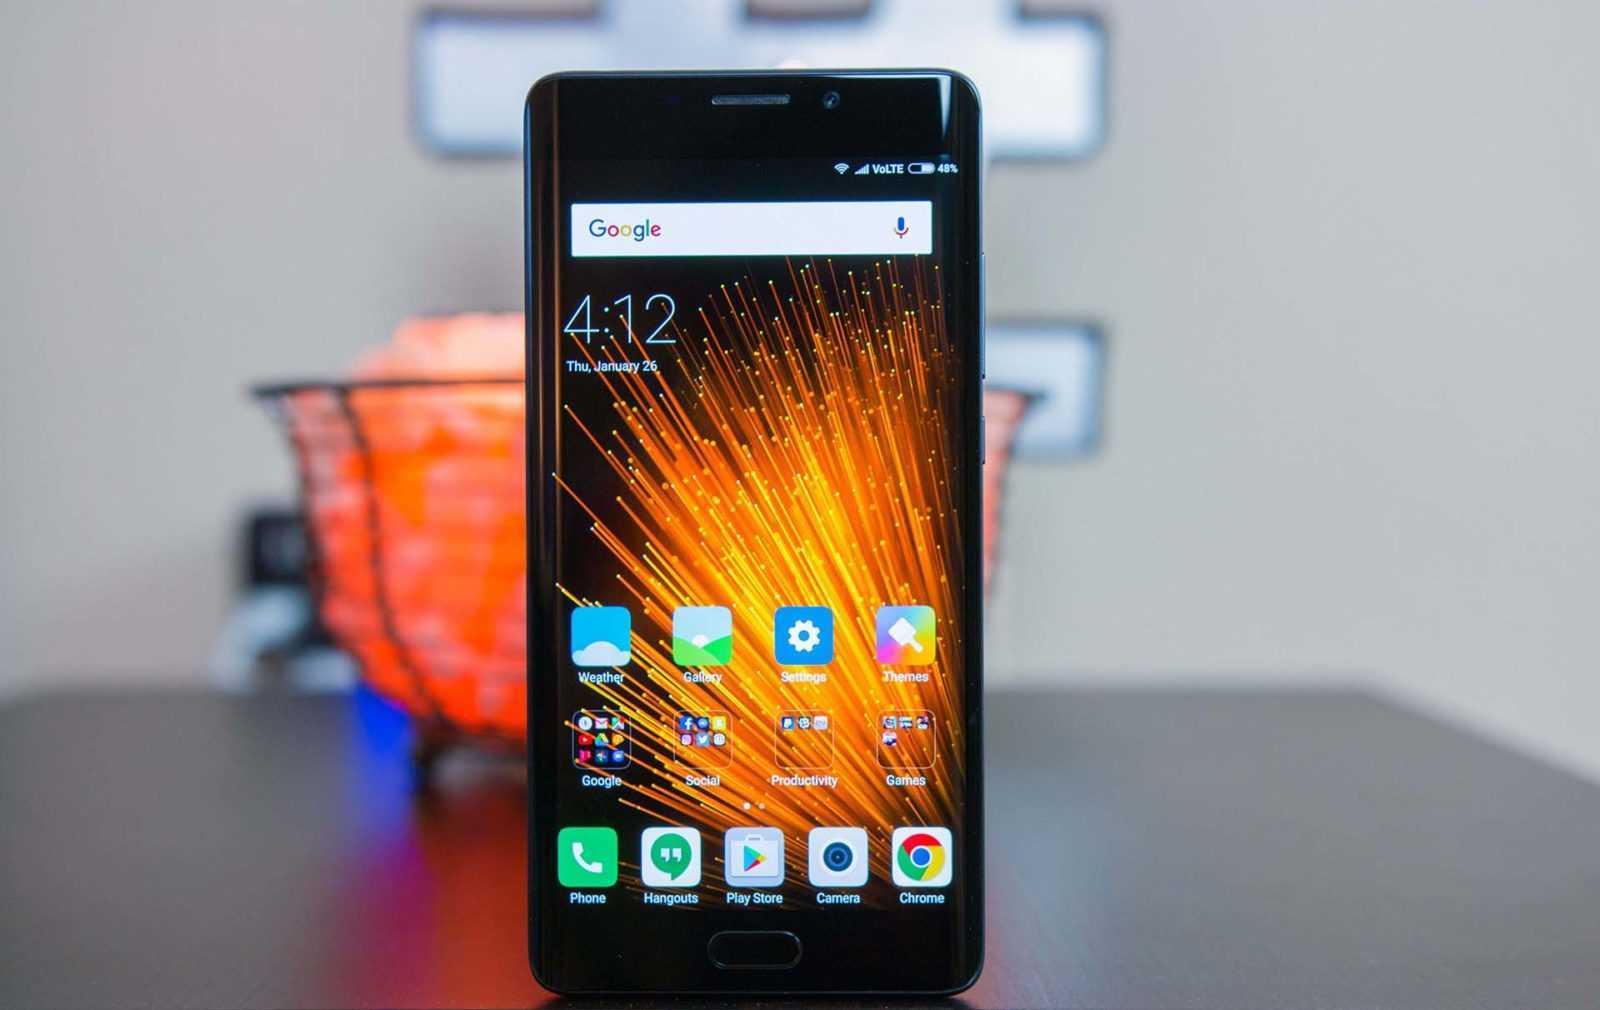 Xiaomi Mi Note 2: Особенности, плюсы и минусы